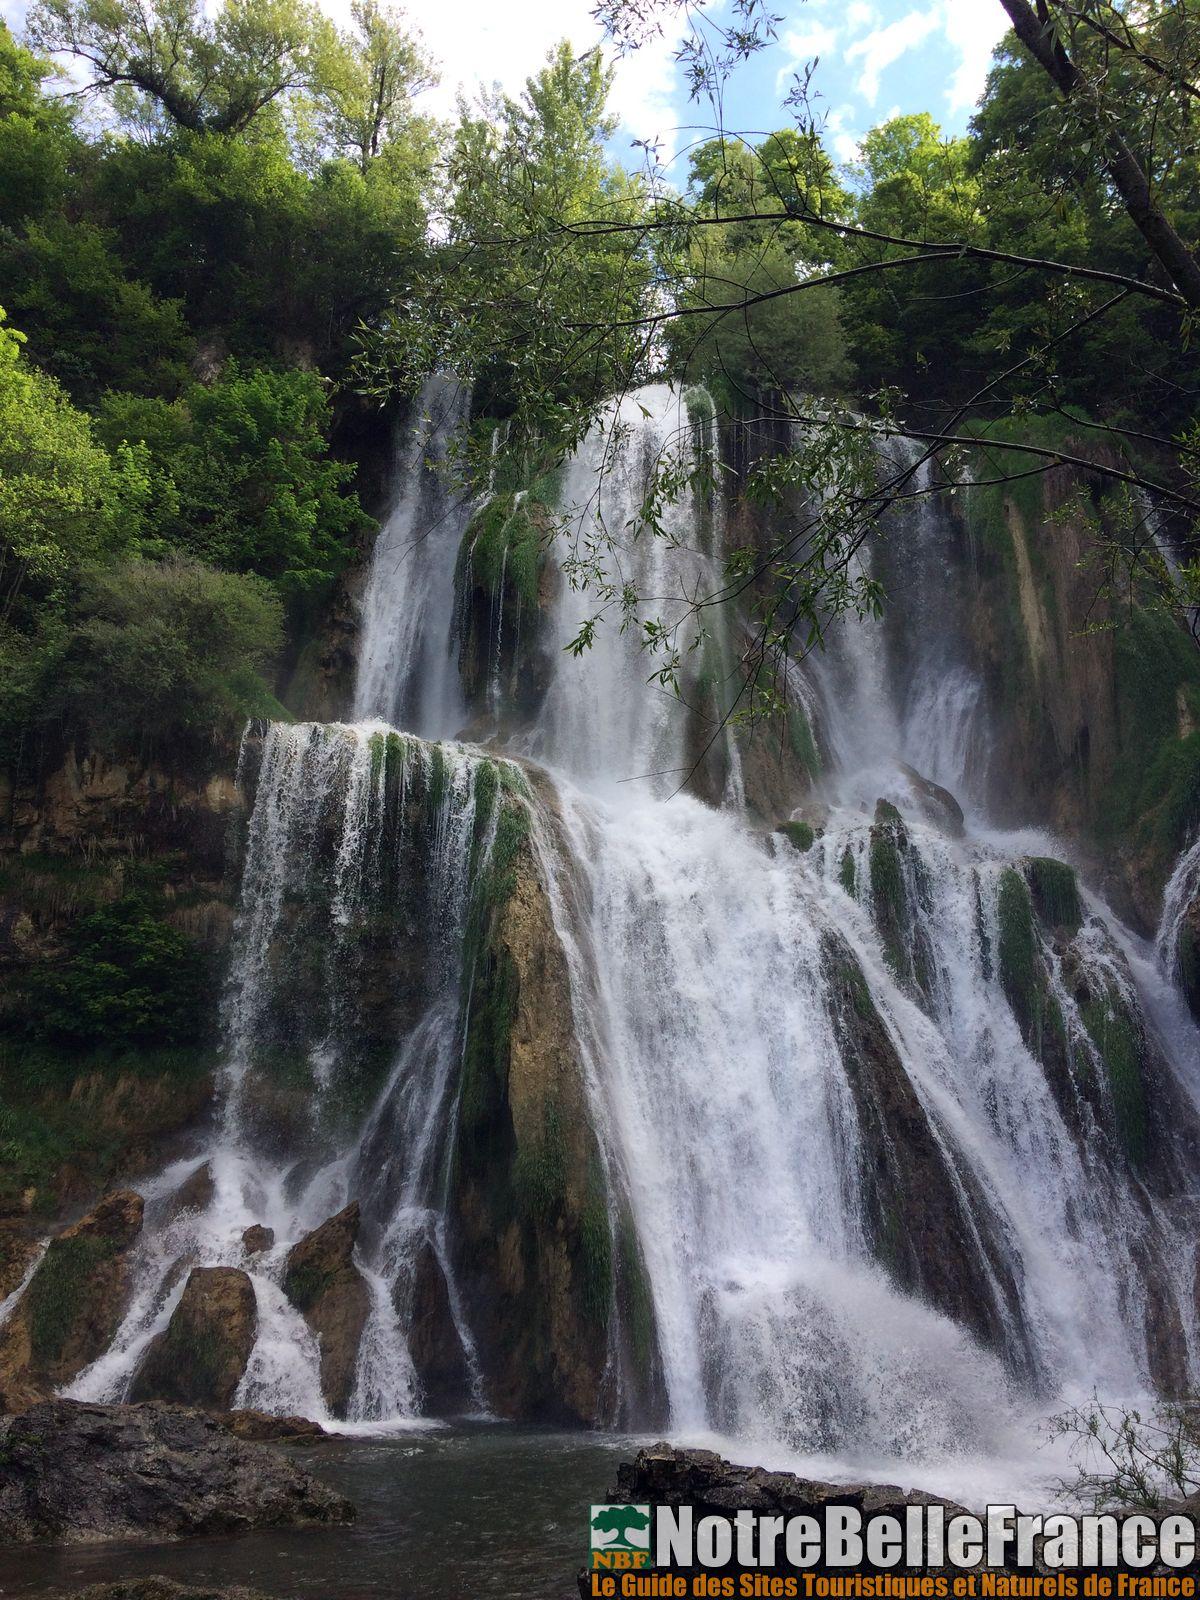 Souvent Sites naturels de l'Ain - Notrebellefrance KZ52